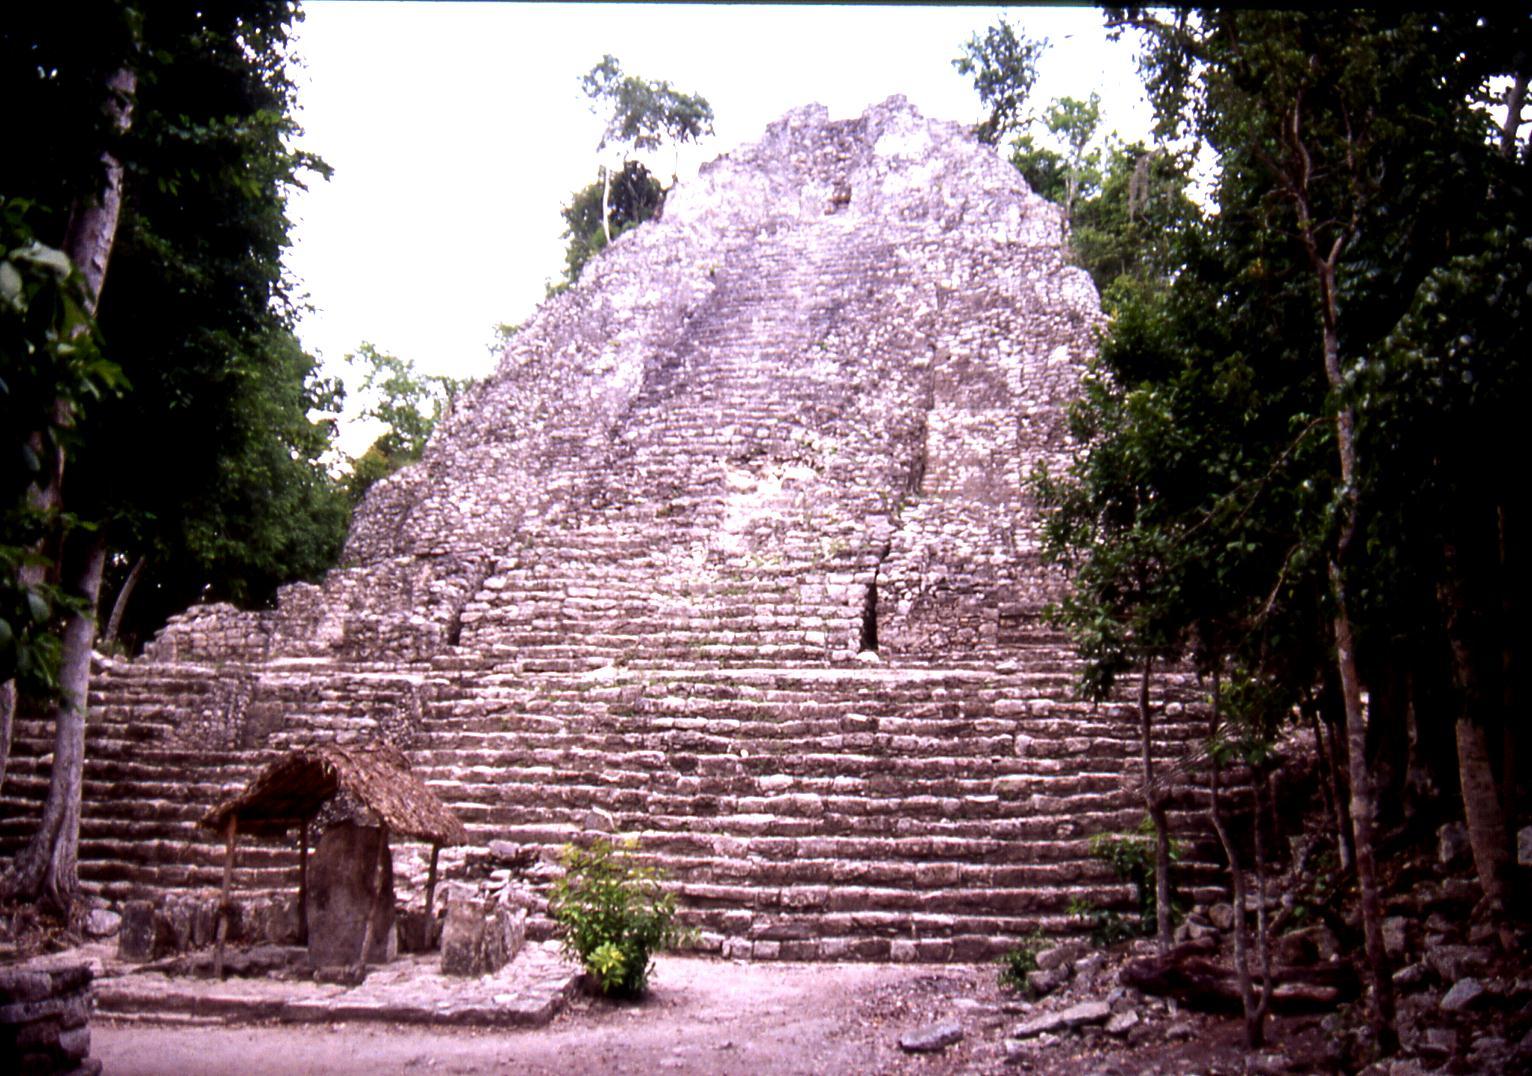 File:Cobá, Pyramide de Cobá 001 L.D.jpg - Wikimedia Commons